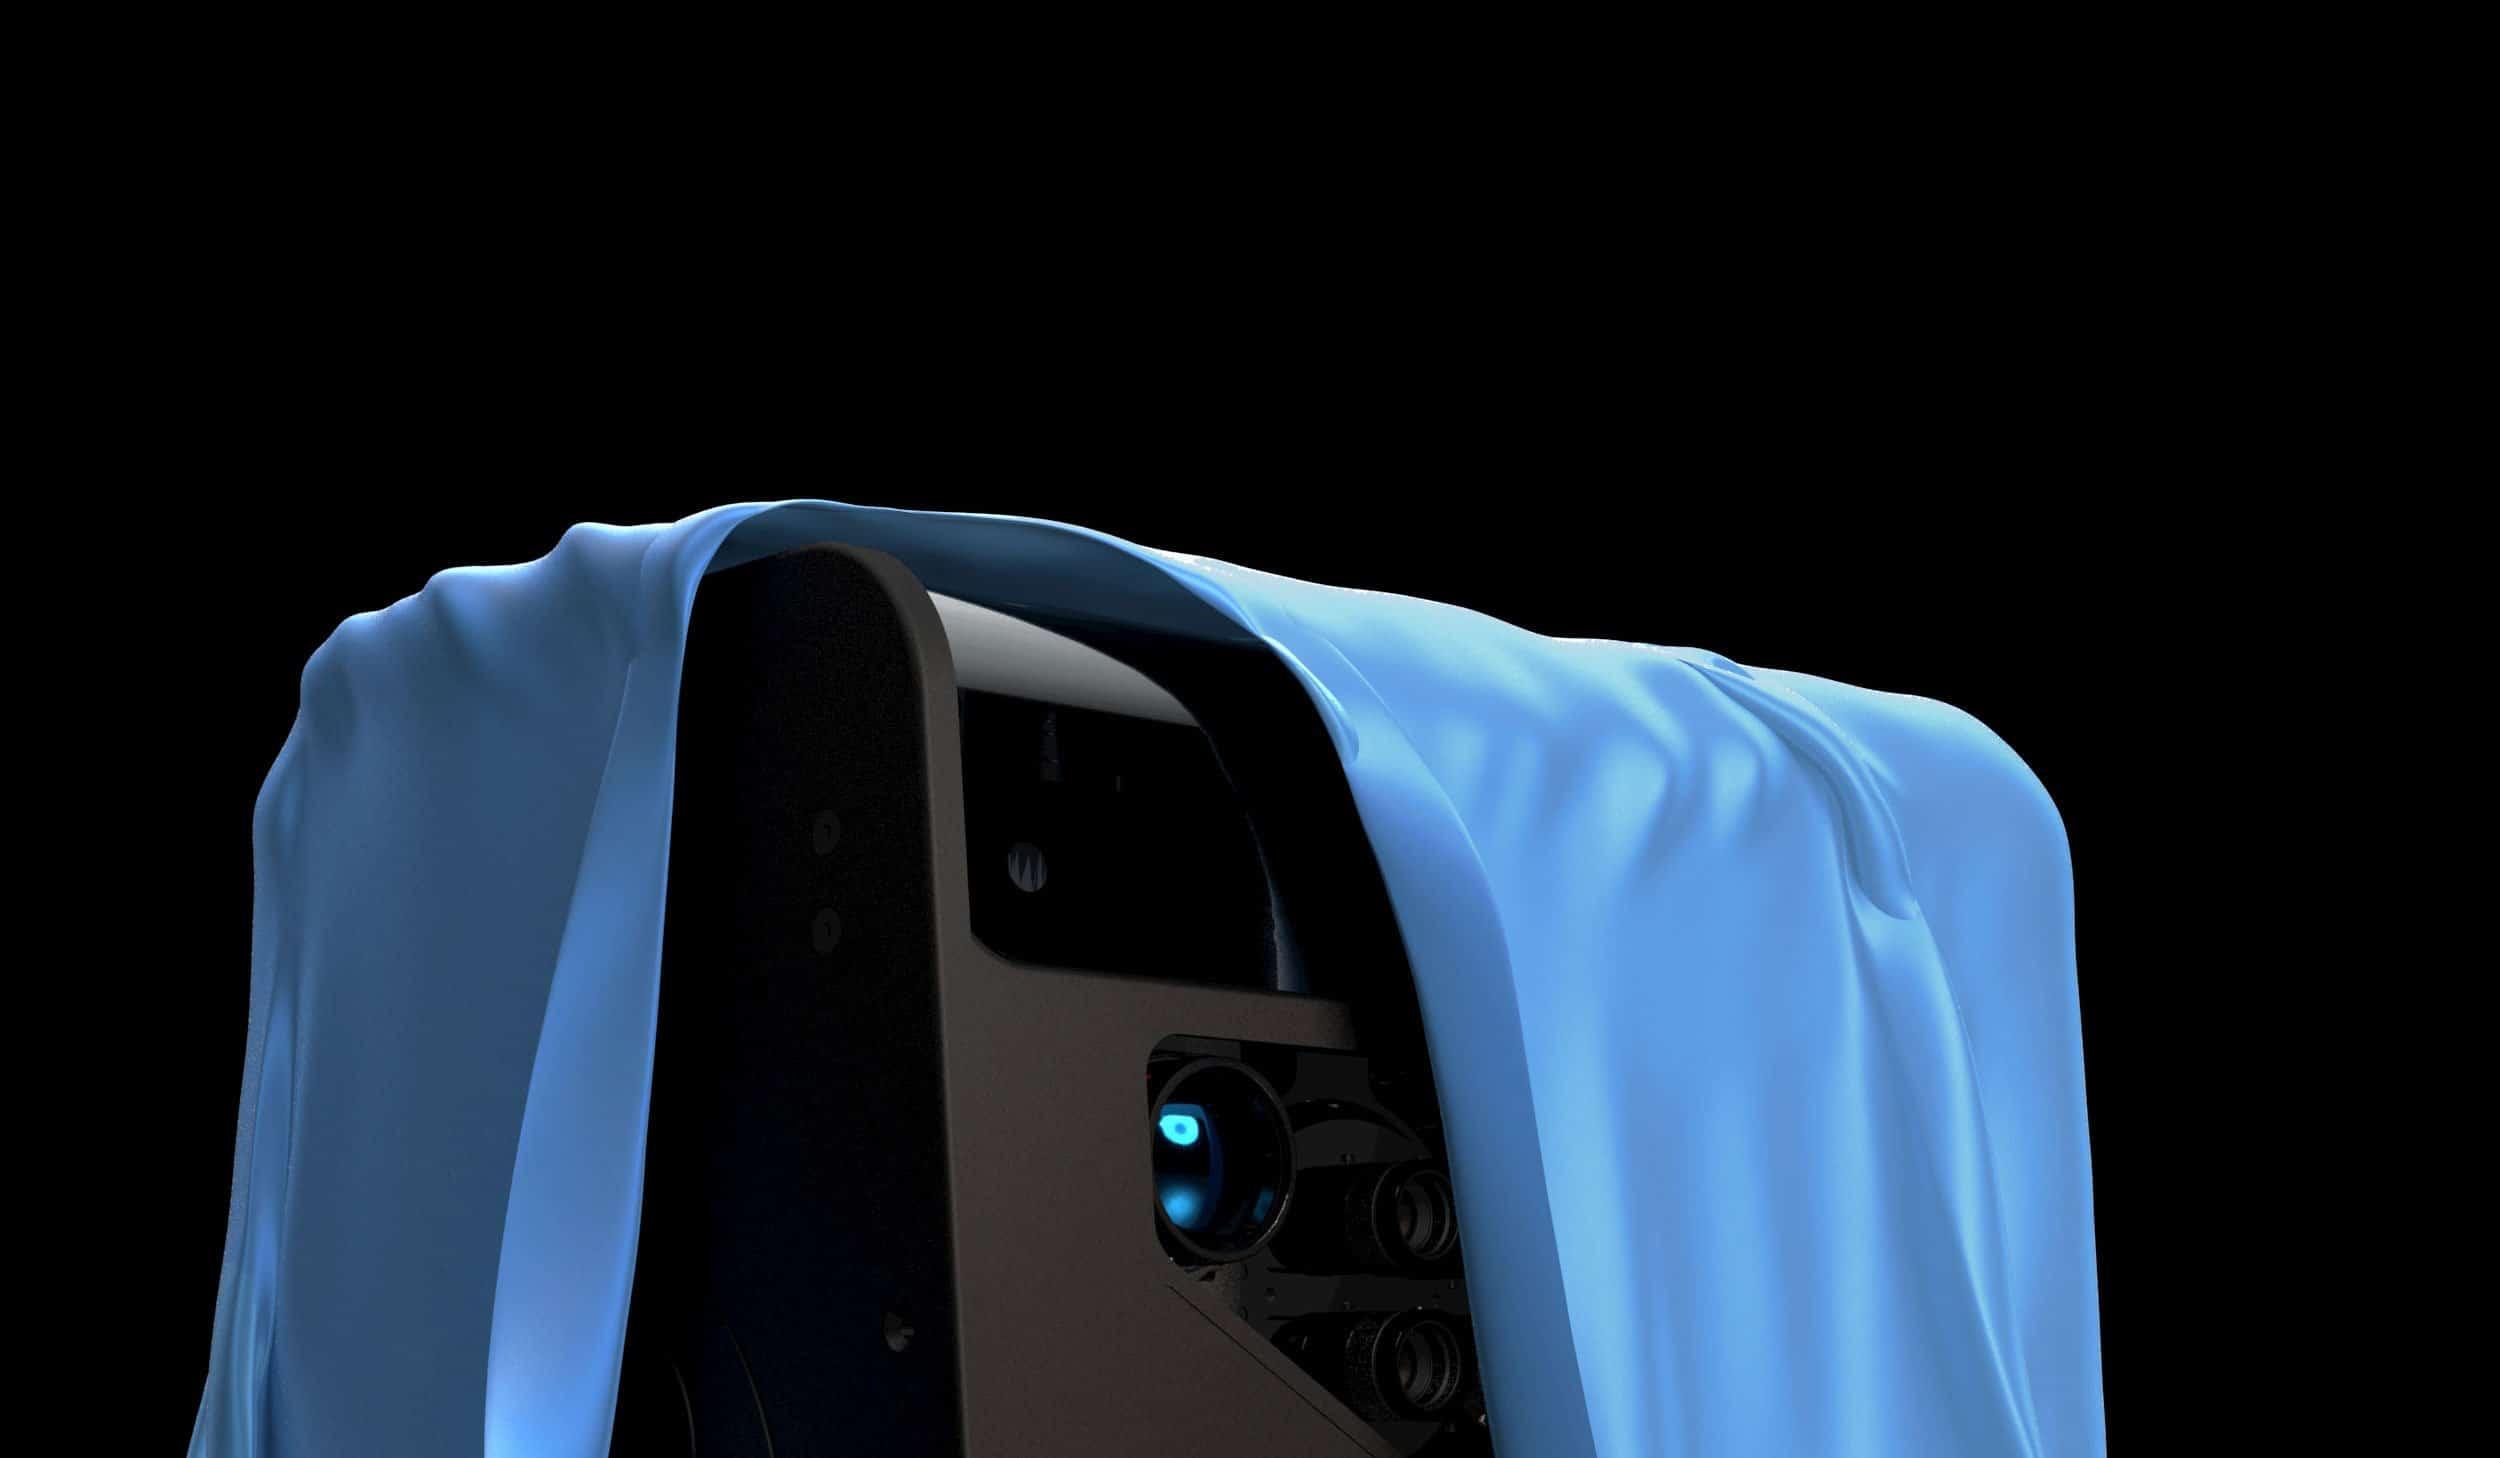 BROMPTON TECHNOLOGY UNVEILS DYNAMIC CALIBRATION TECHNOLOGY AT LDI 2019